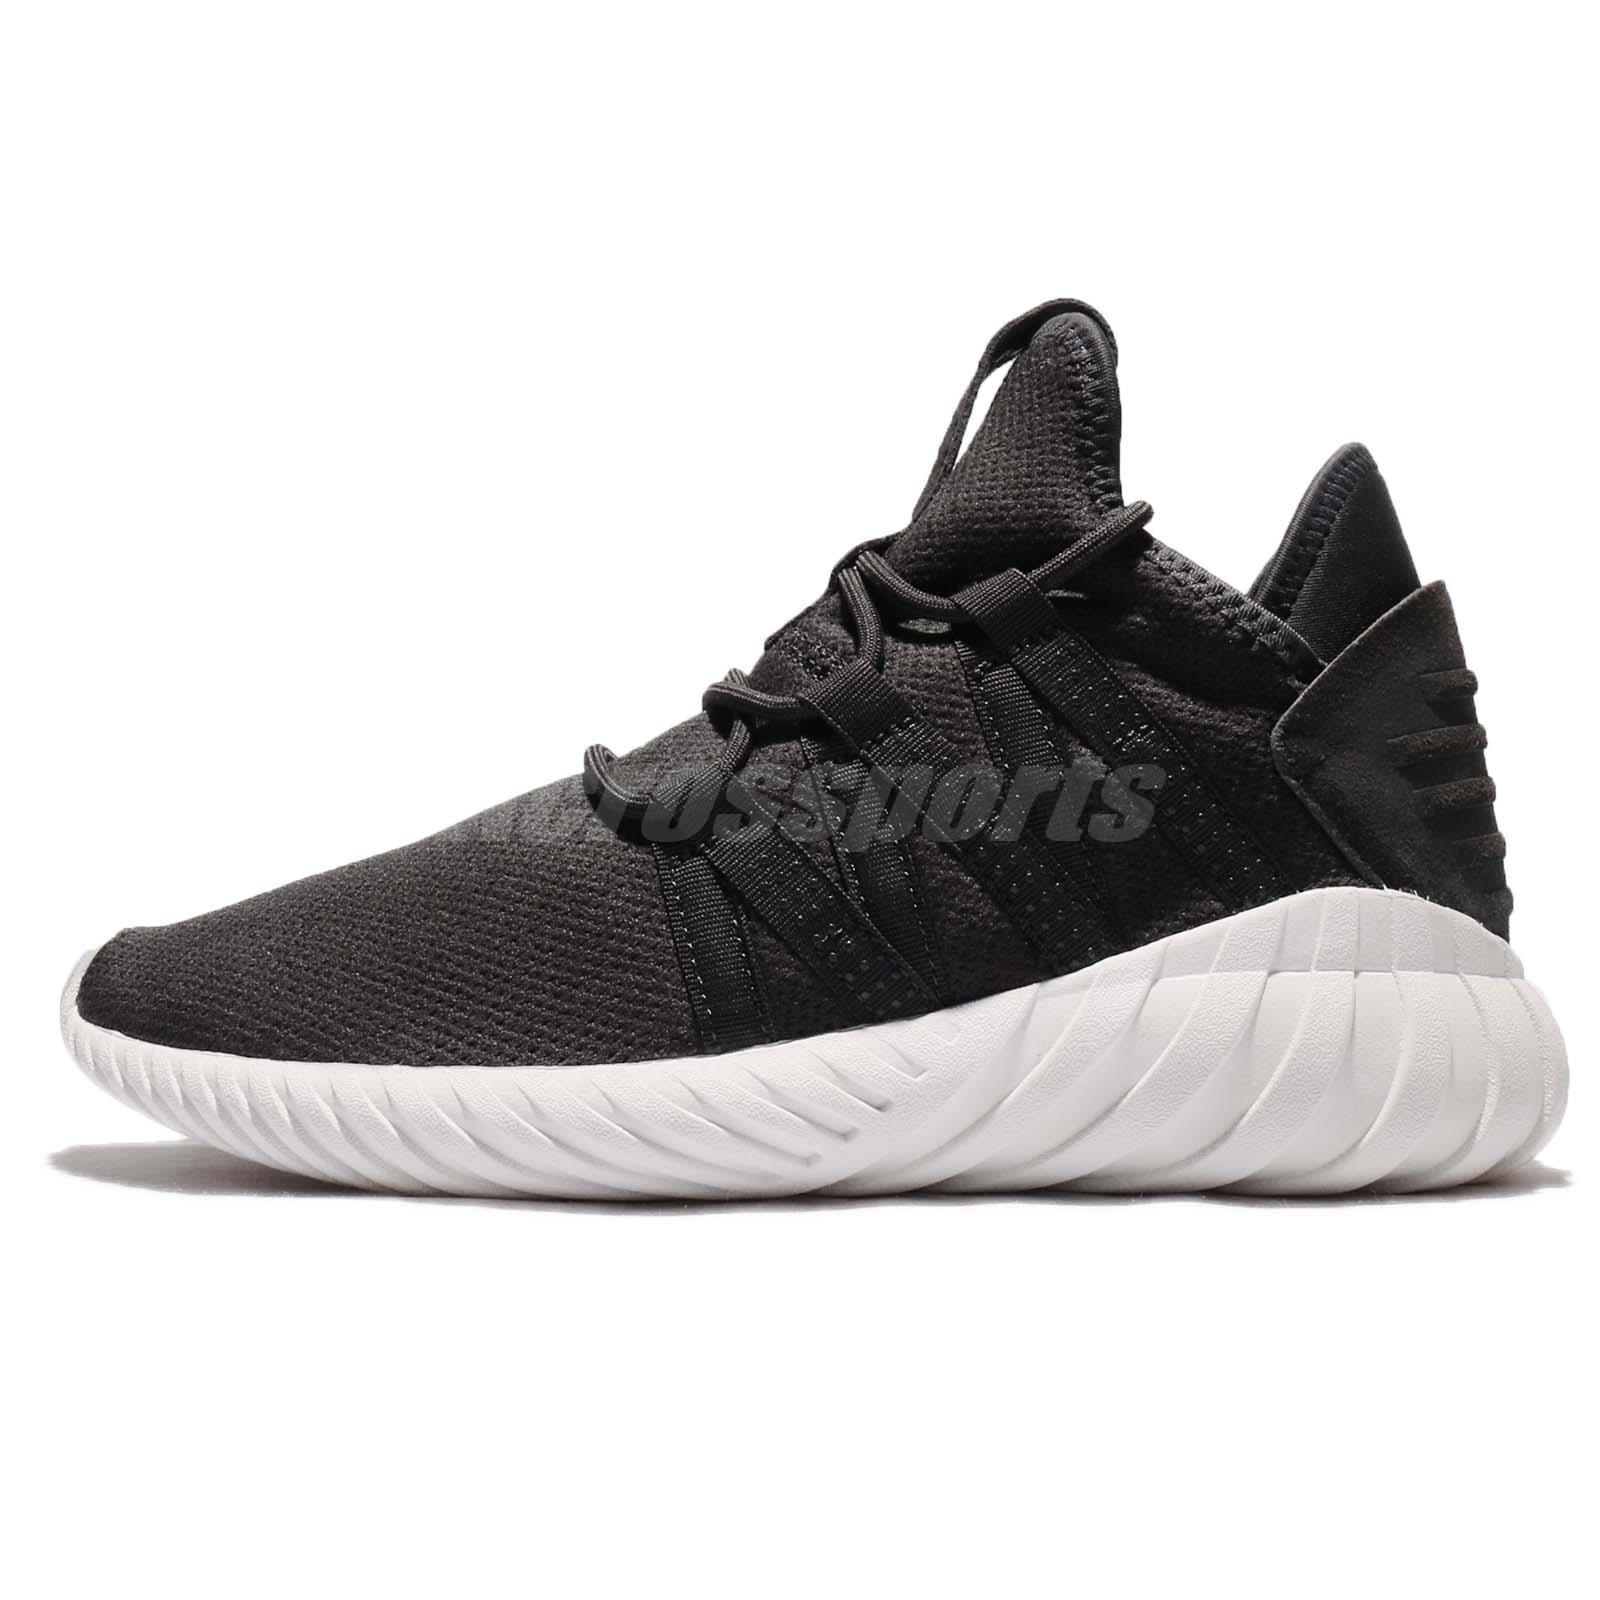 Adidas Original Tubular Dawn Running Sneakers Black Grey BZ0631